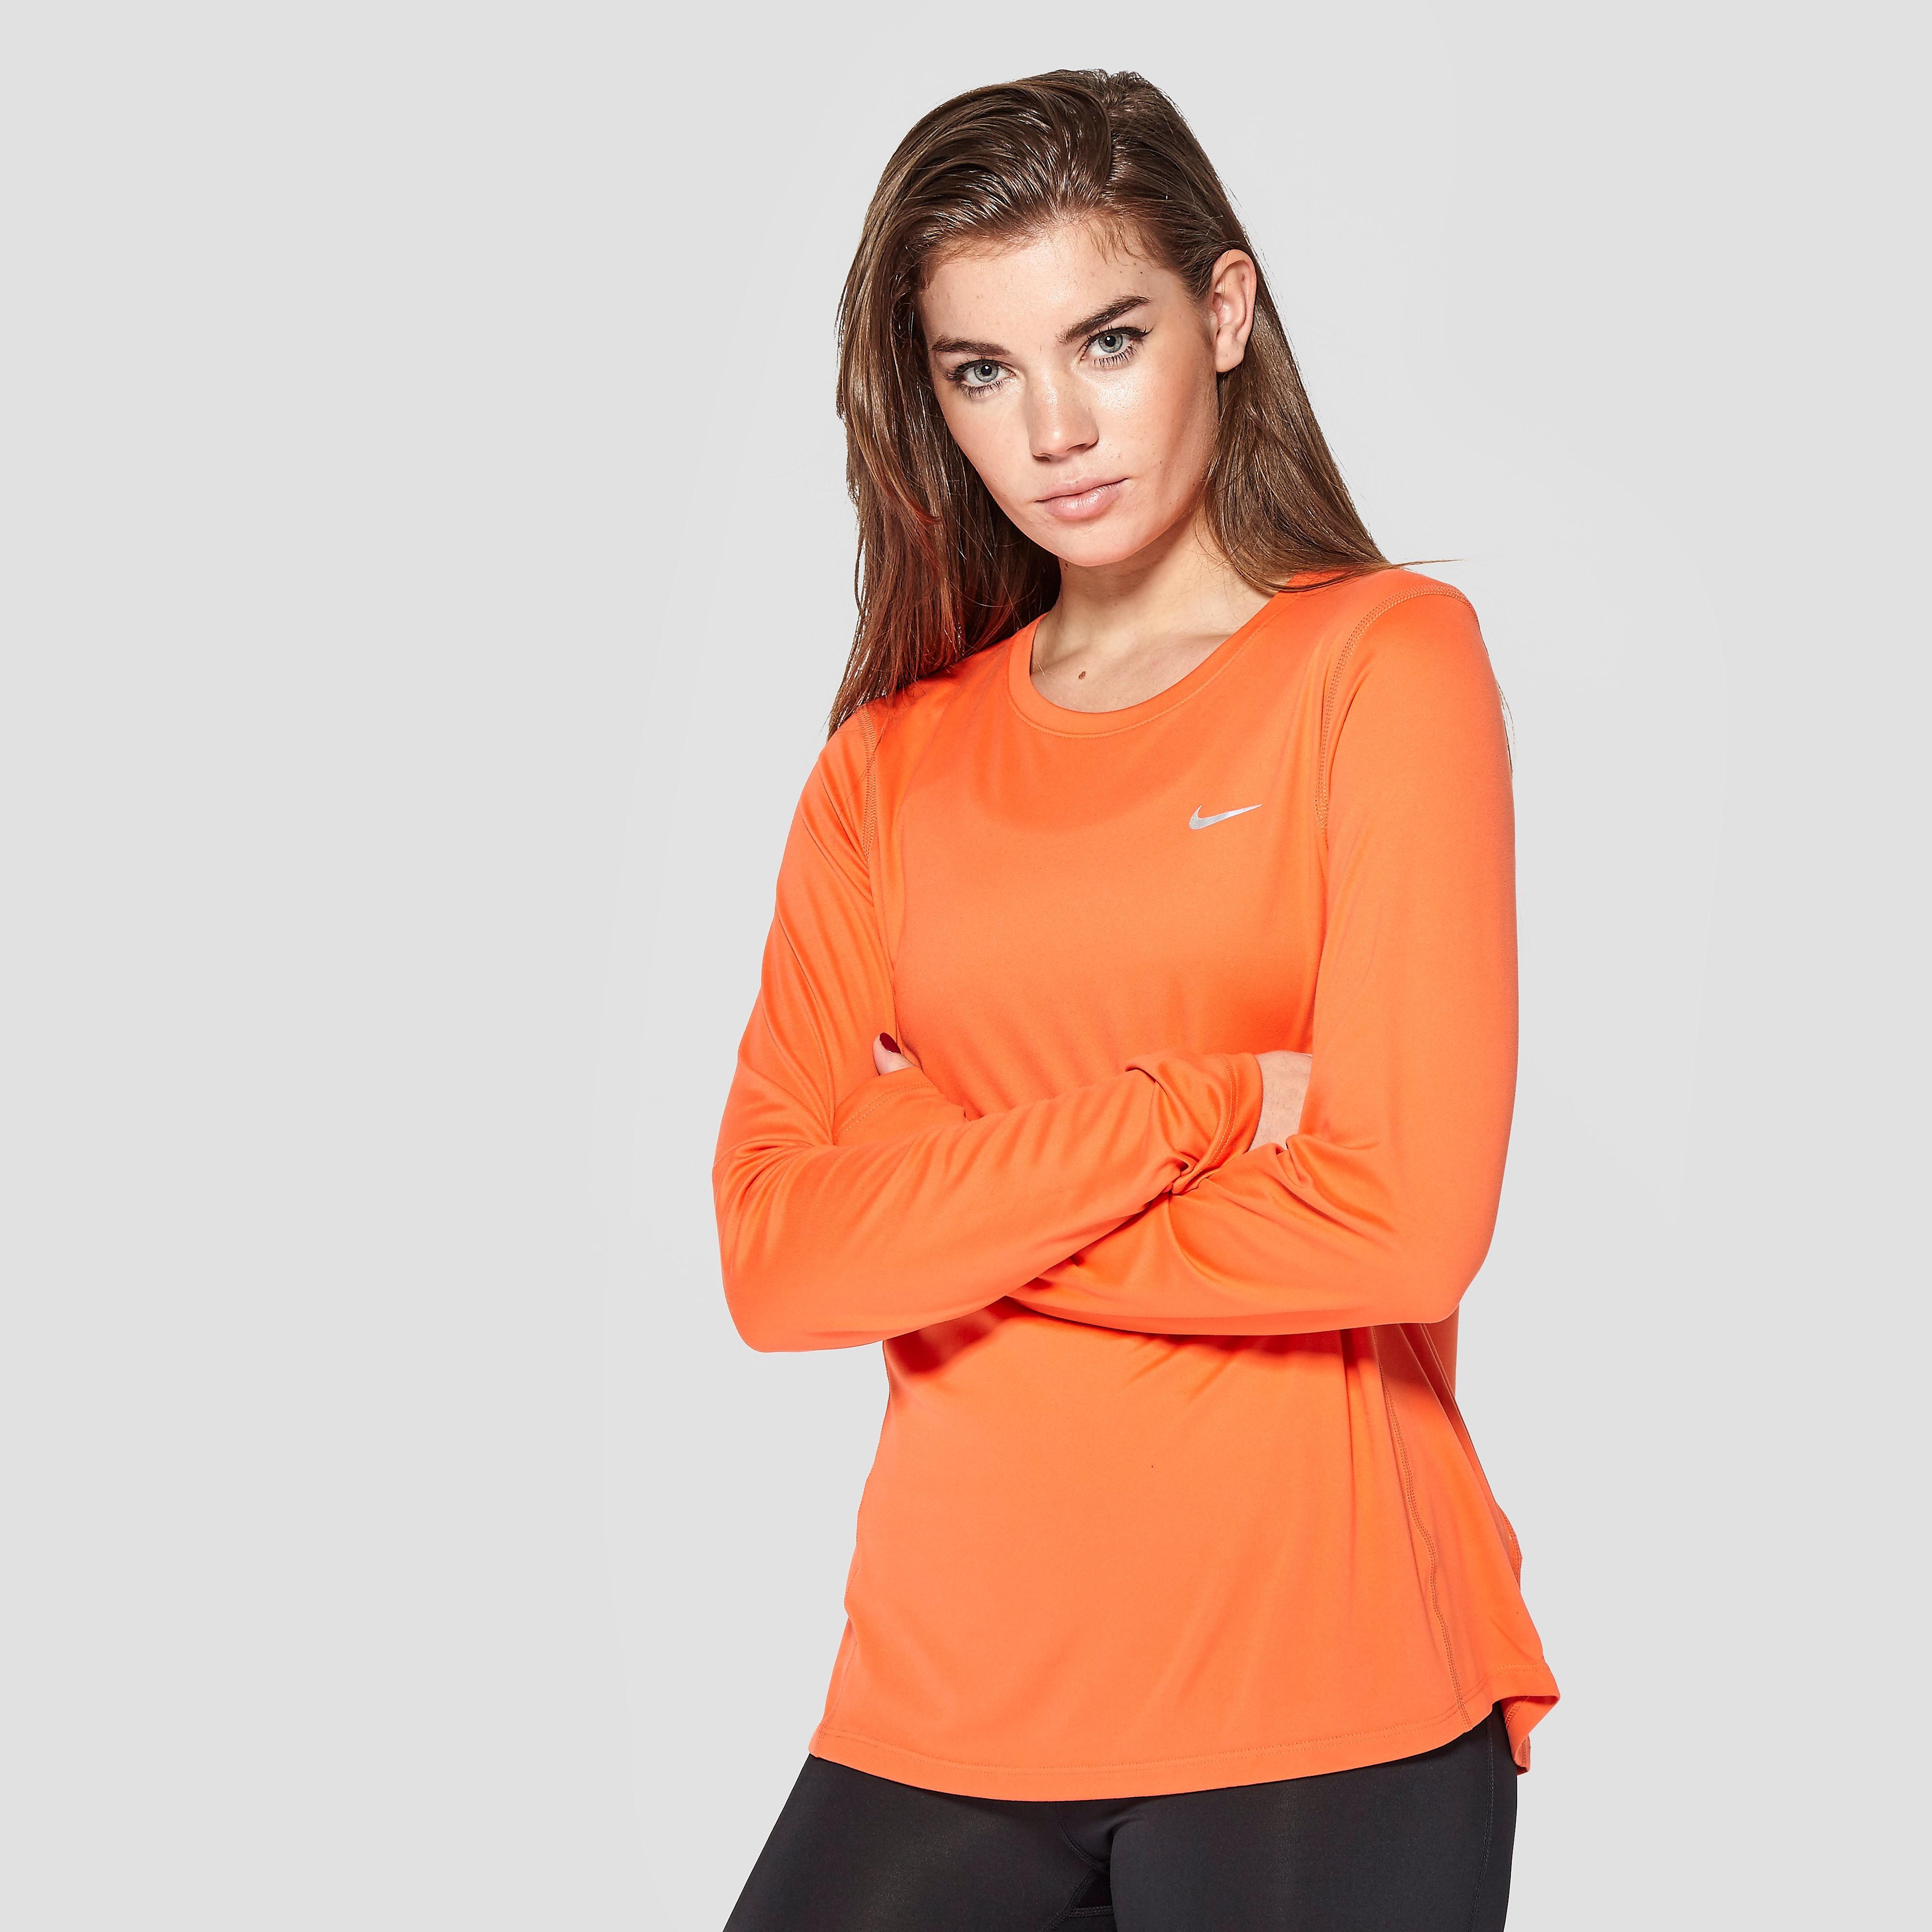 Nike Women's Miler Long Sleeve Shirt